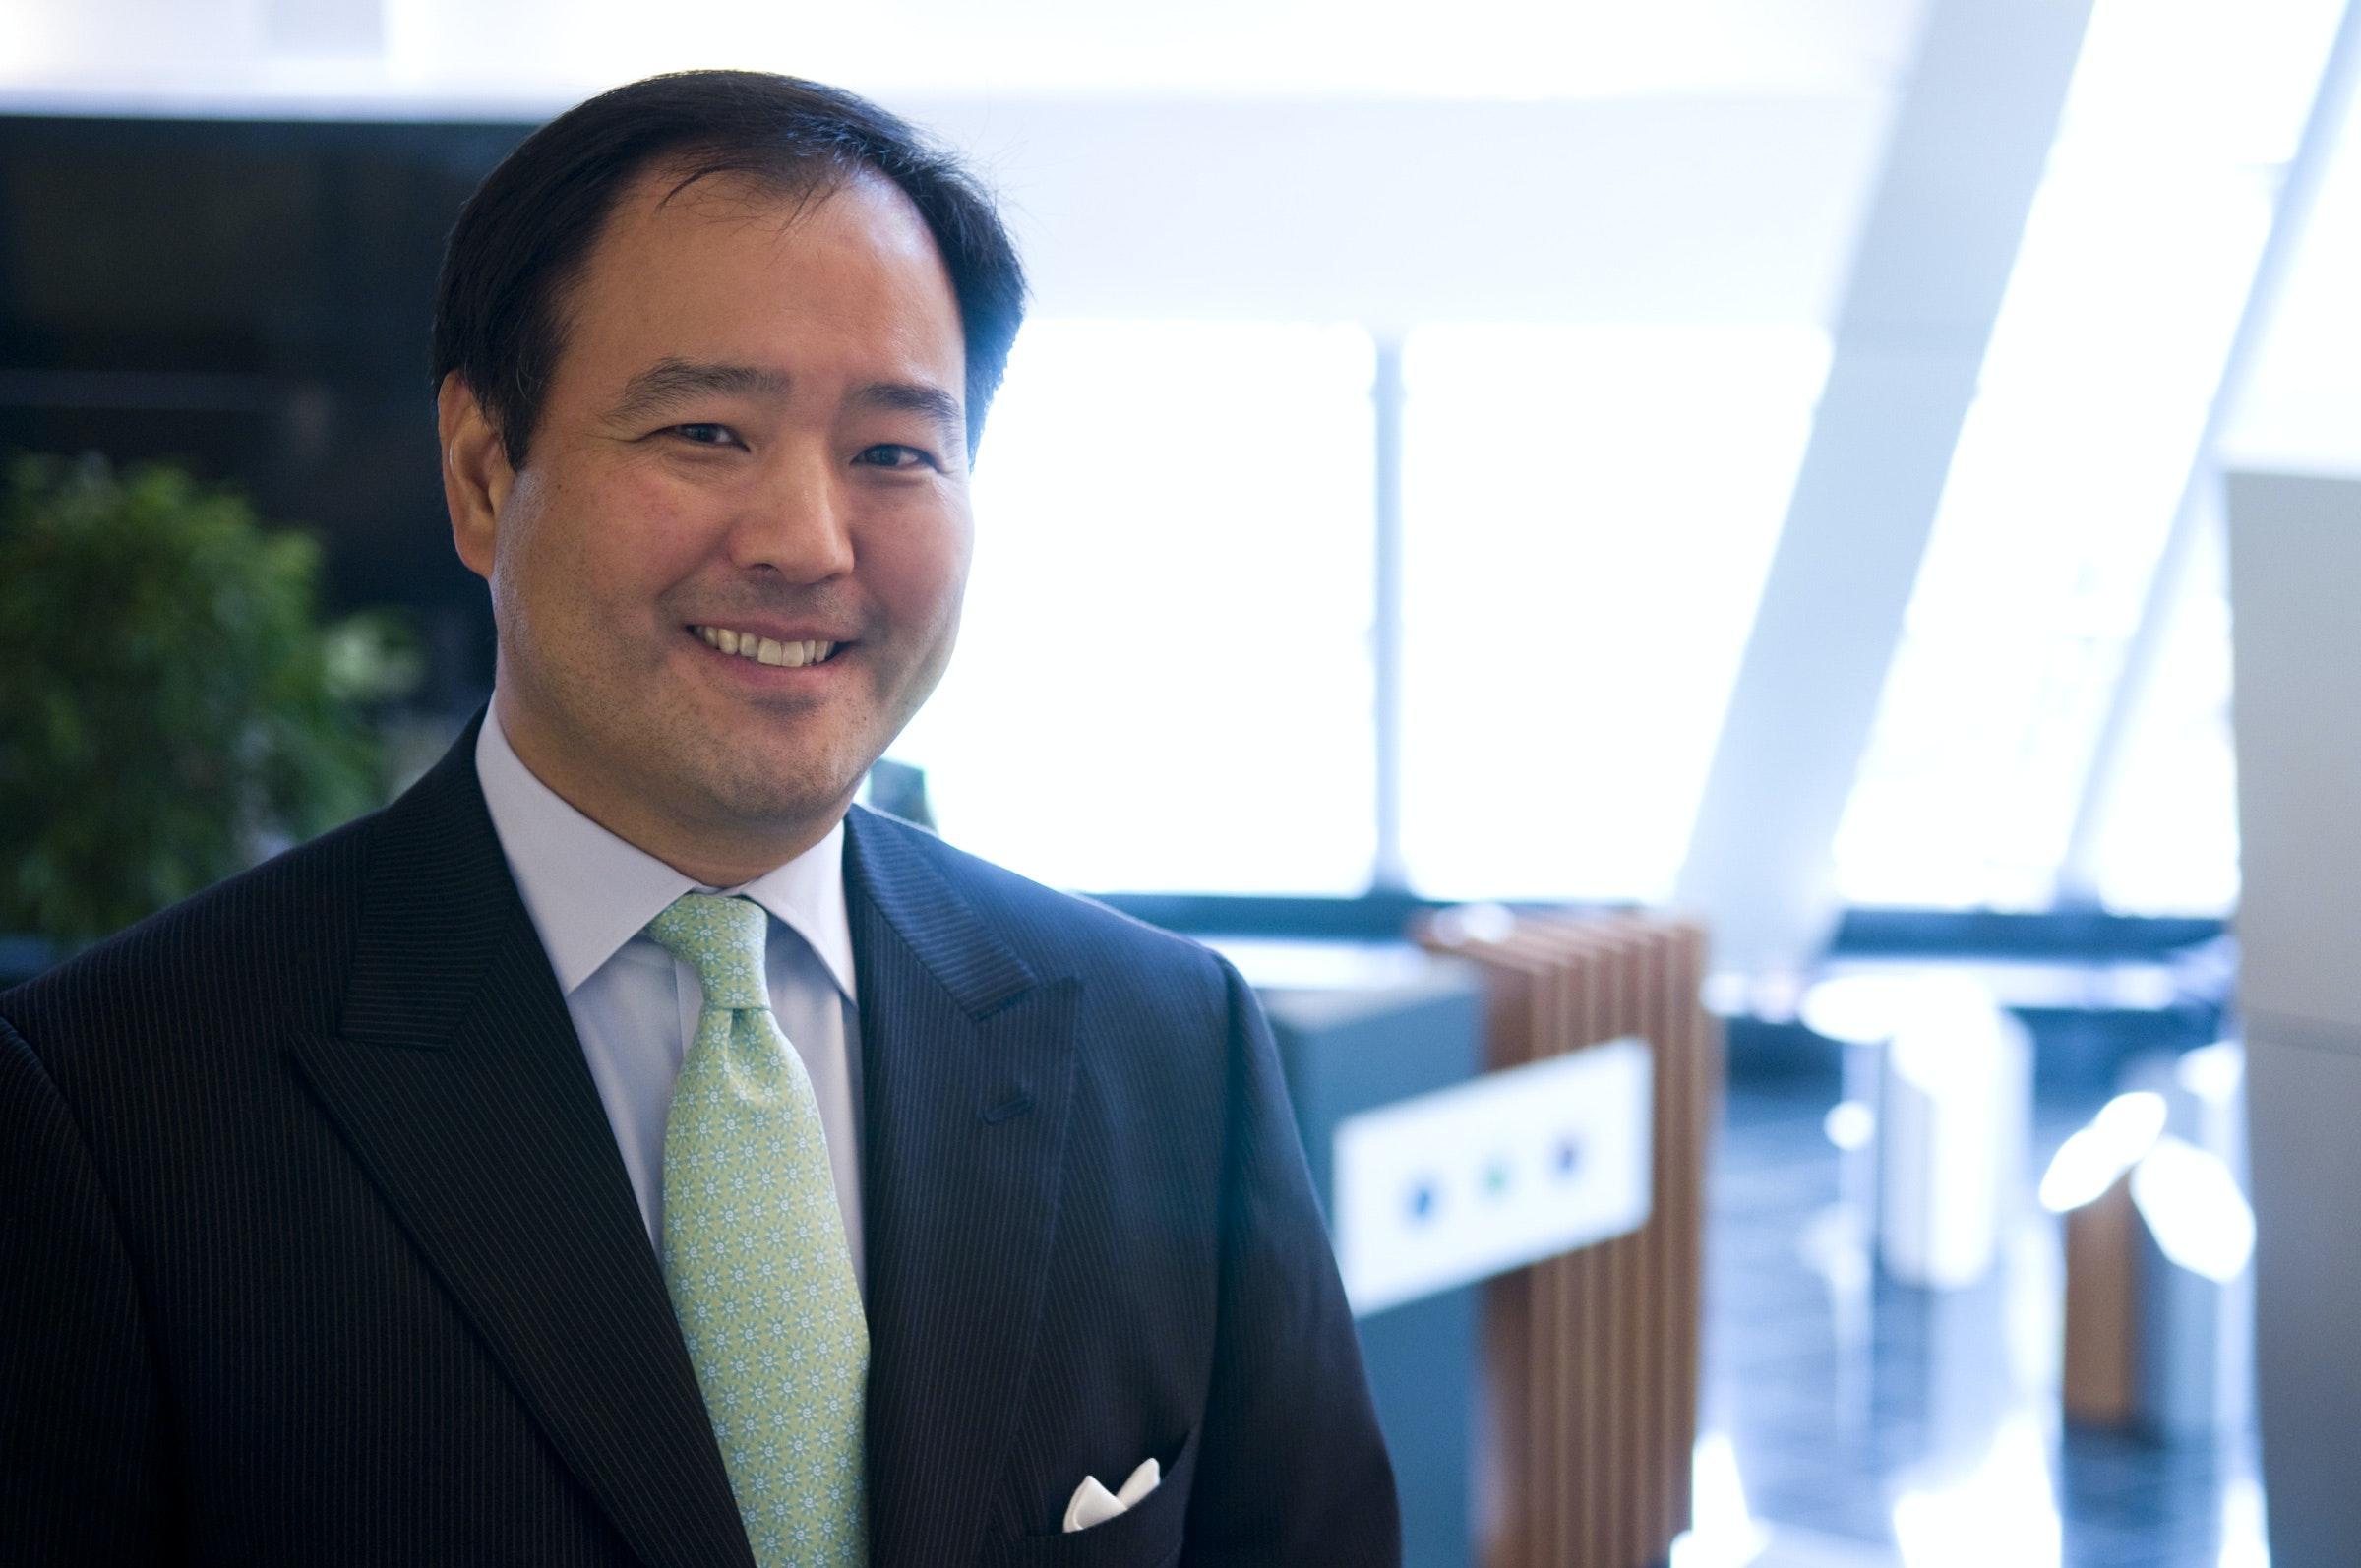 Senior Vice President, Marketing and Communications